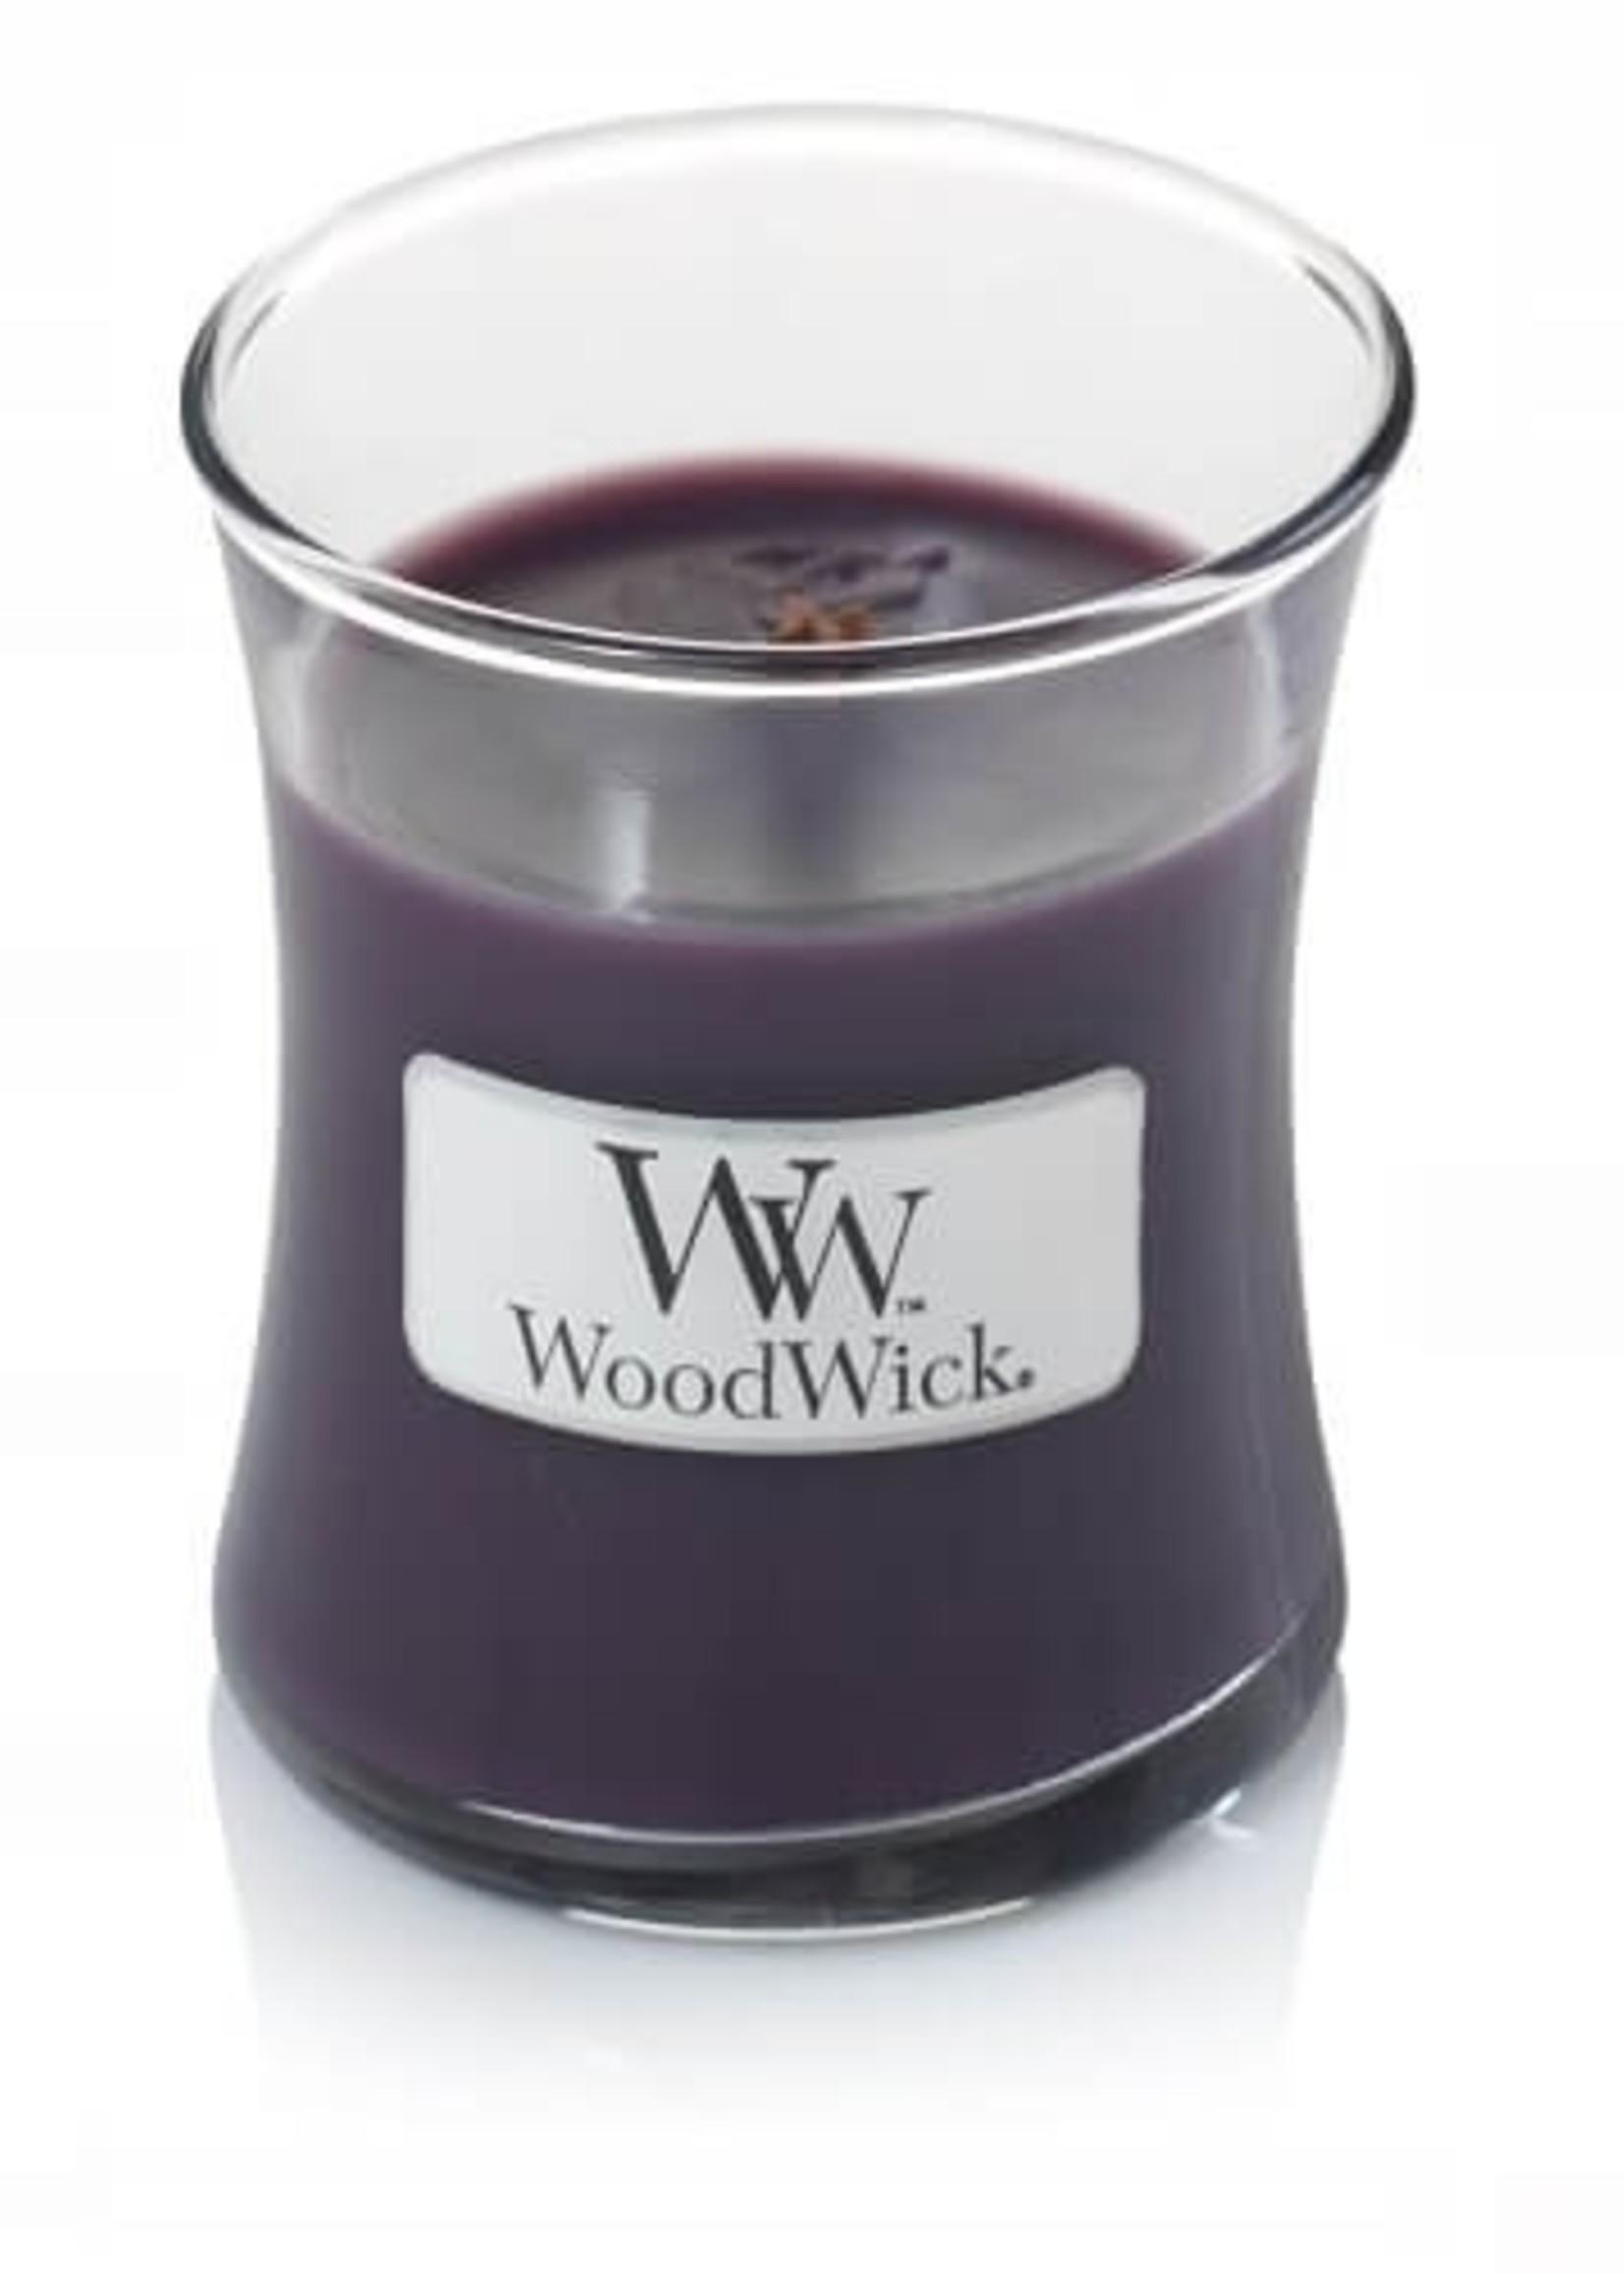 Woodwick Woodwick Fig Mini Candle